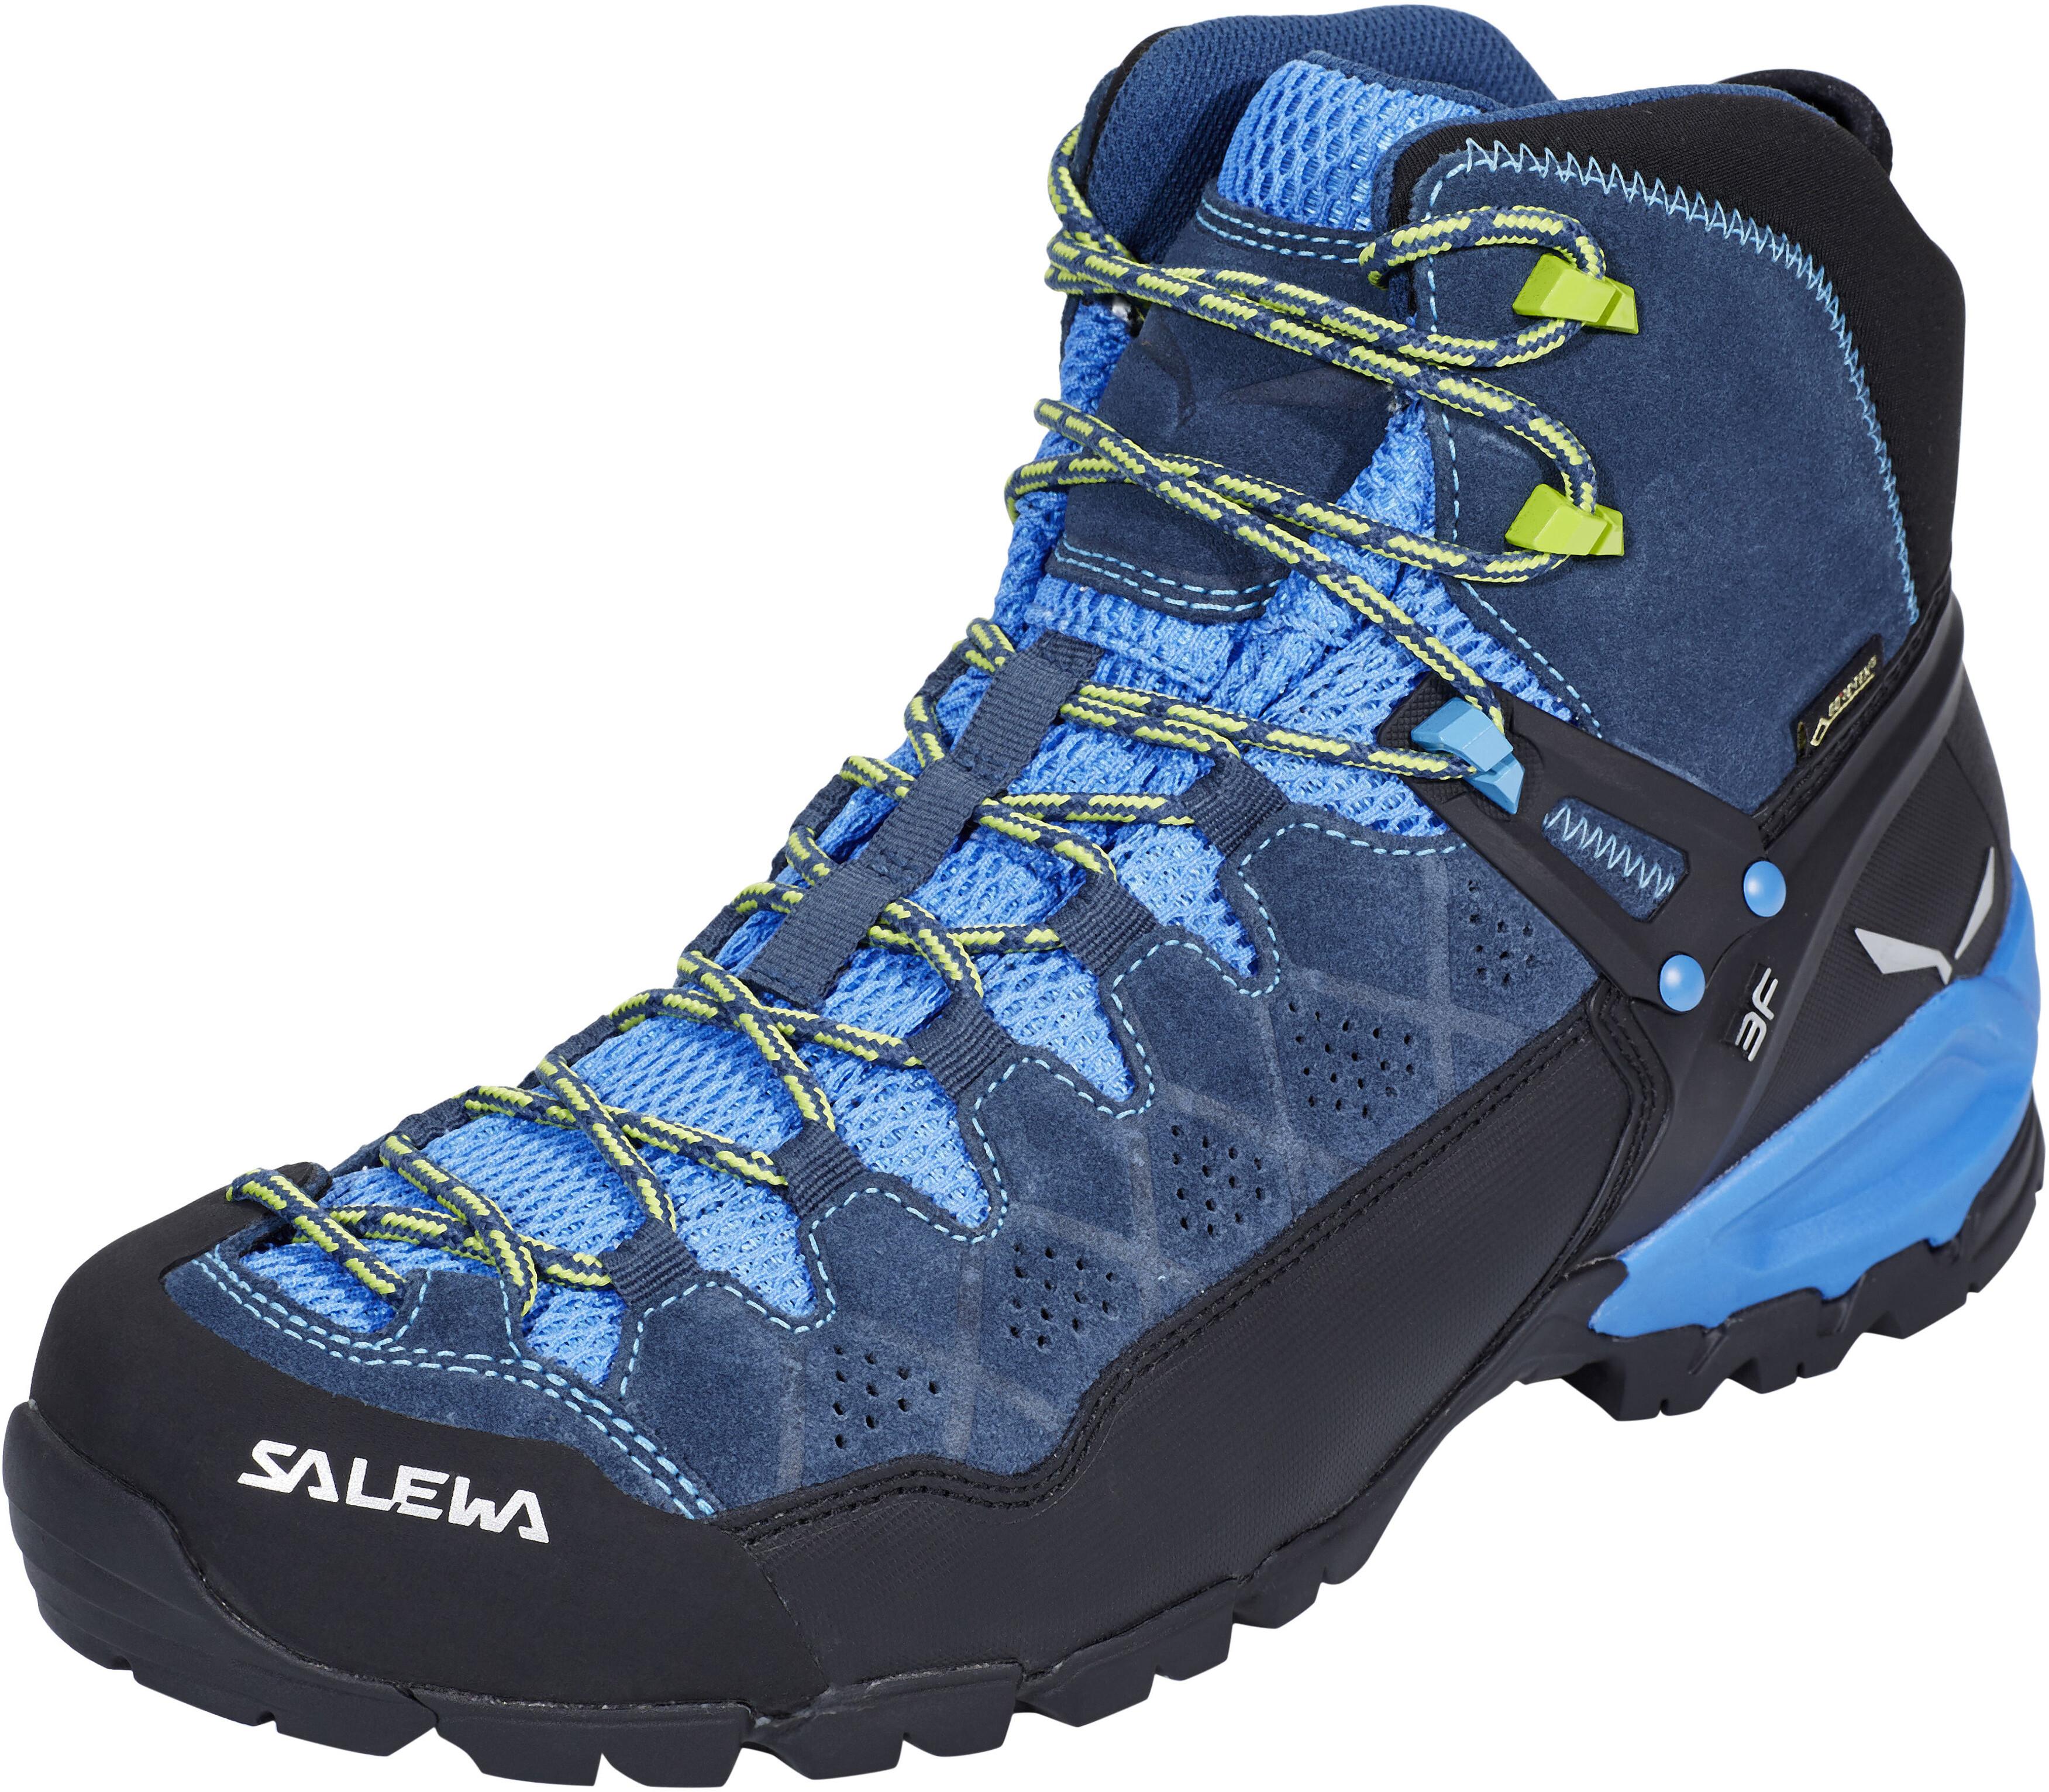 2d8174d3ccff1 Salewa Alp Trainer Mid GTX - Chaussures Homme - bleu sur CAMPZ !